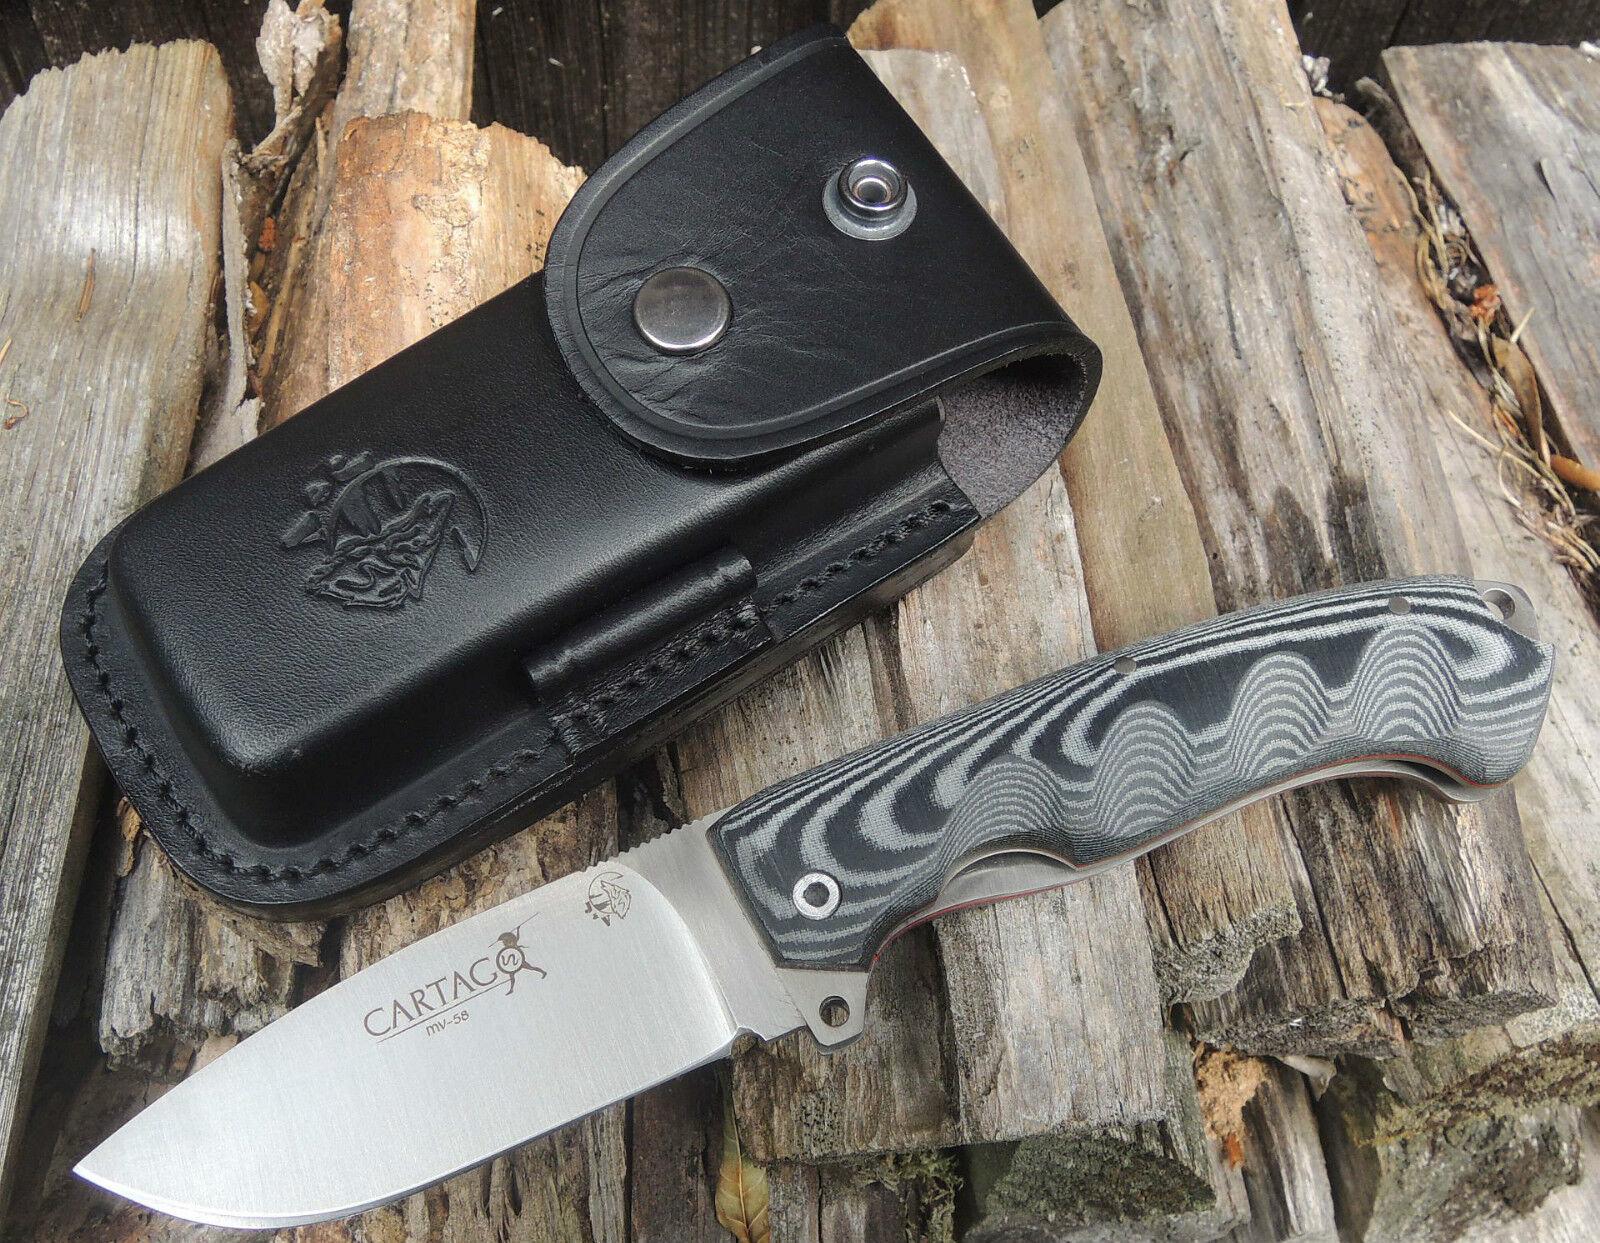 J&V Adventure Knives Cartago Outdoor Taschenmesser MoVa-58 Stahl Micarta Griff